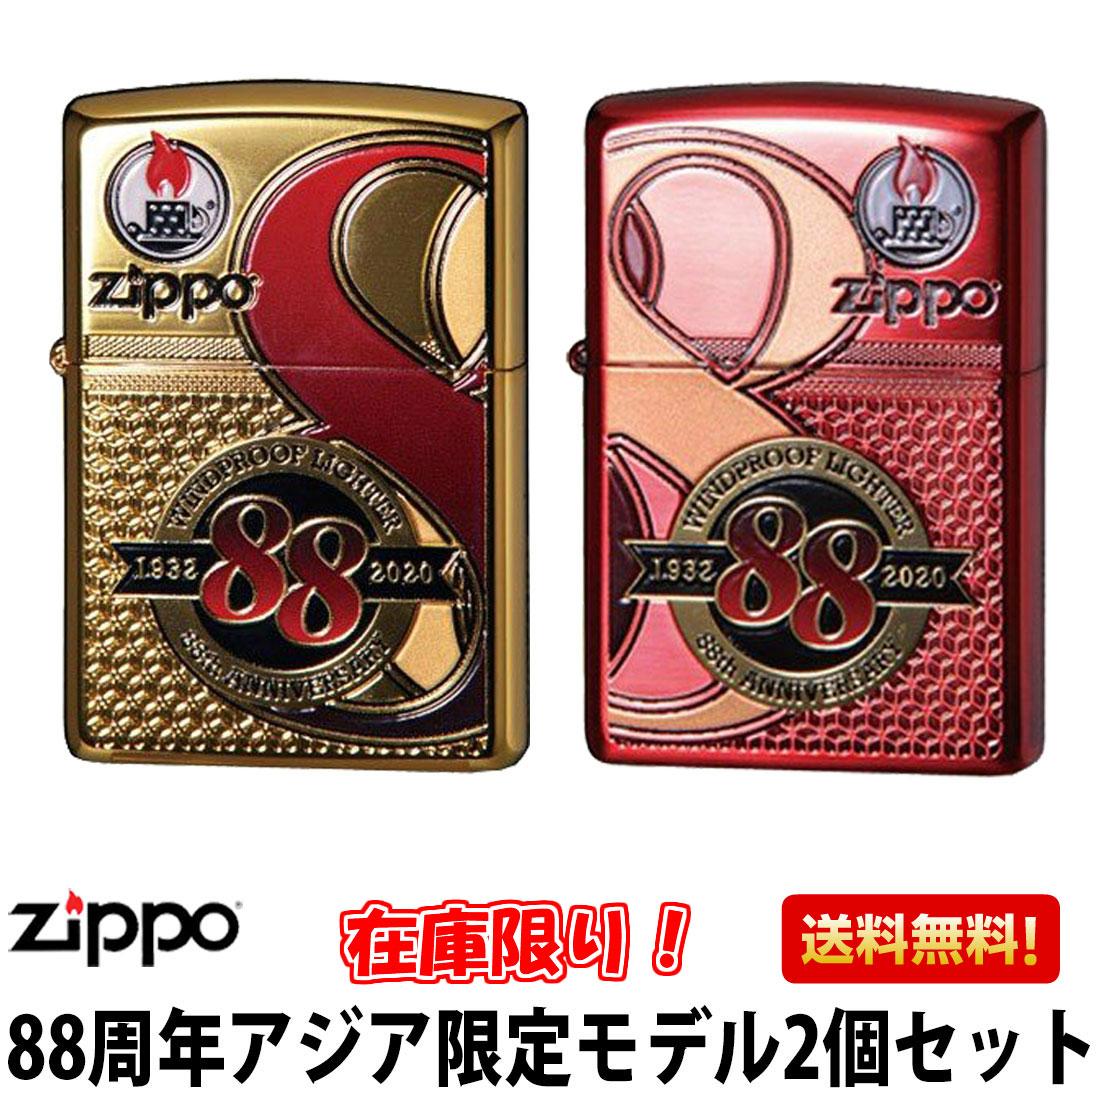 ZIPPO/Zippo社創業88周年記念 アジア限定モデル2個セット画像